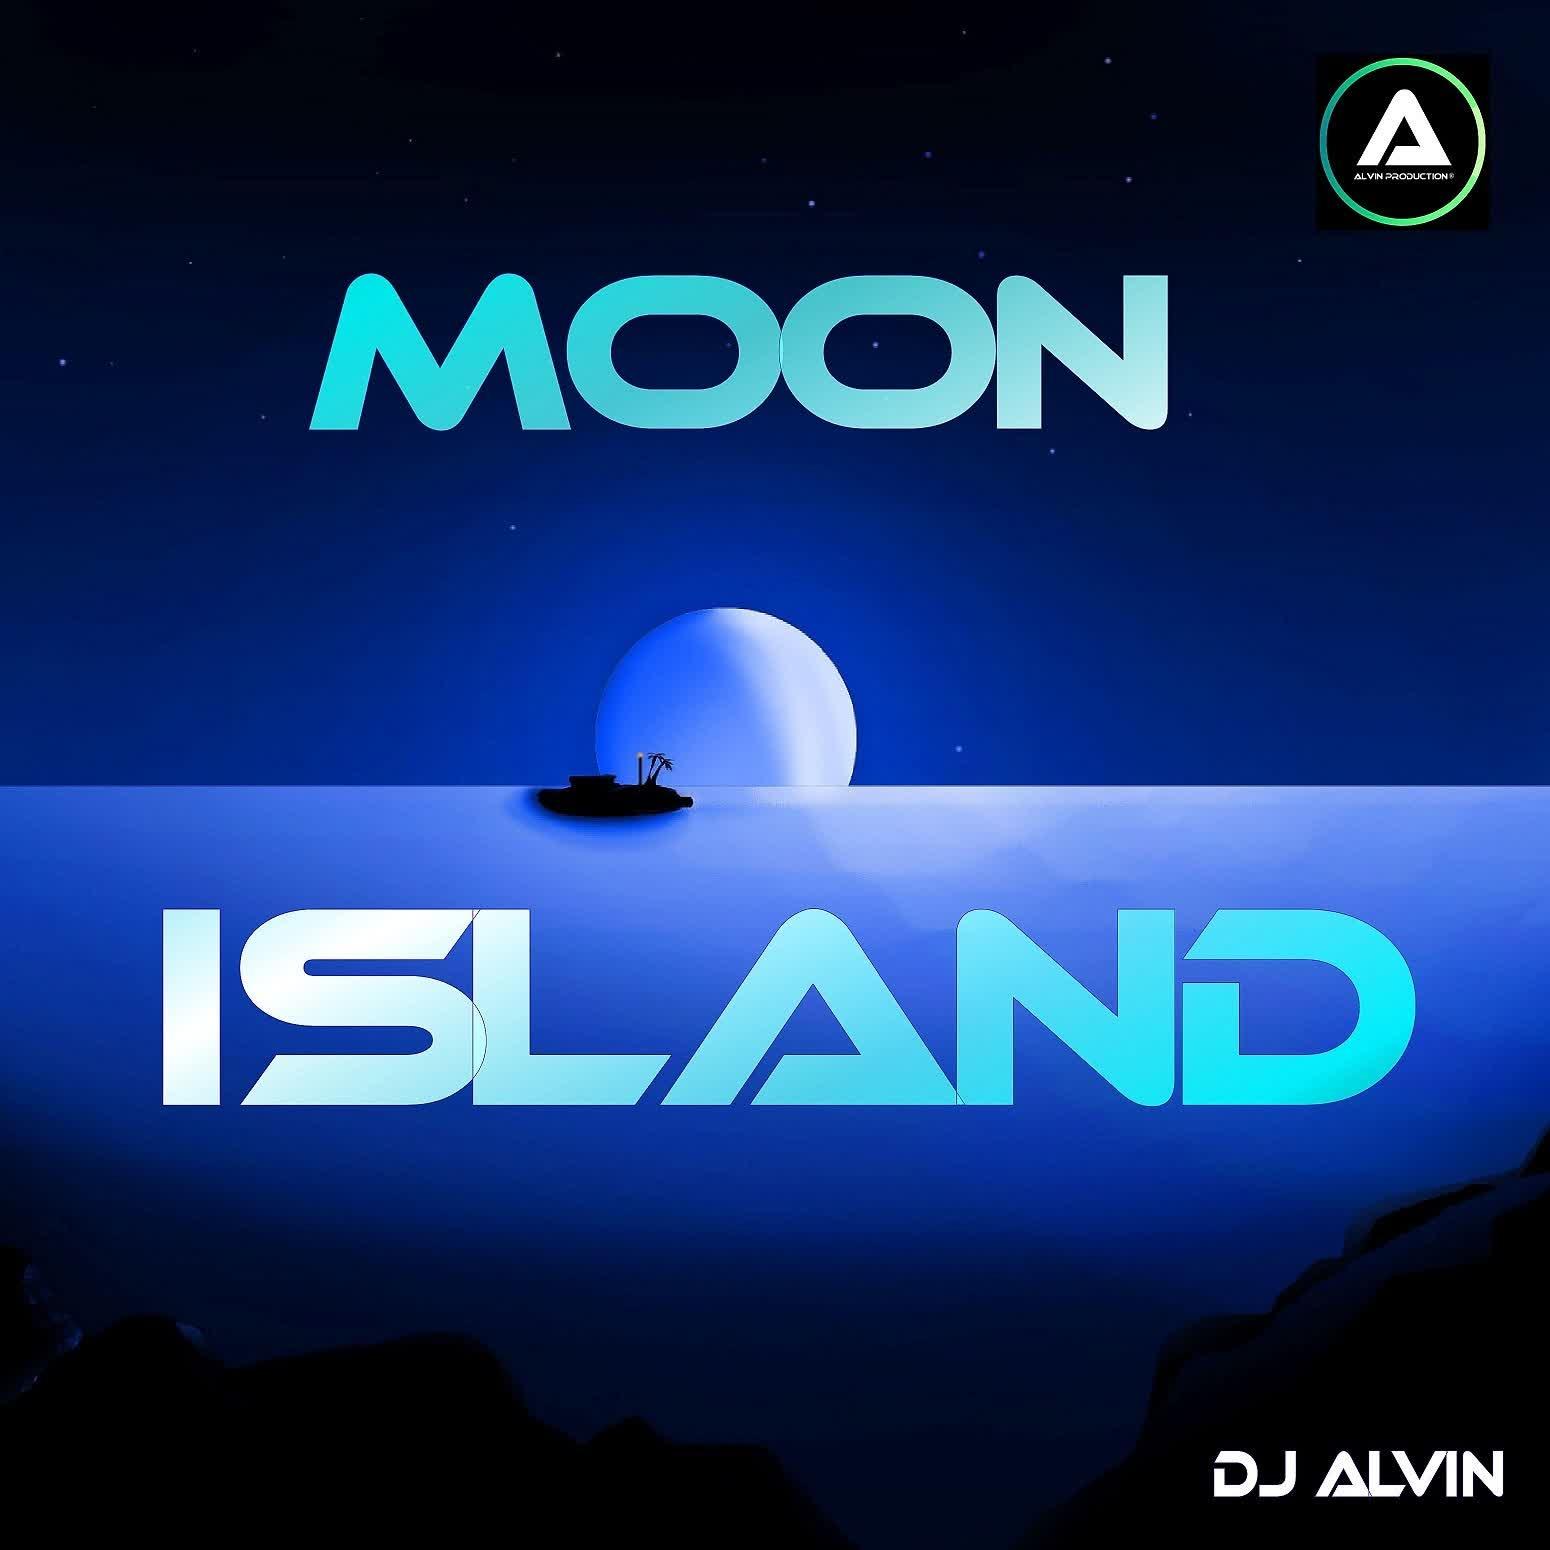 DJ Alvin - Moon Island